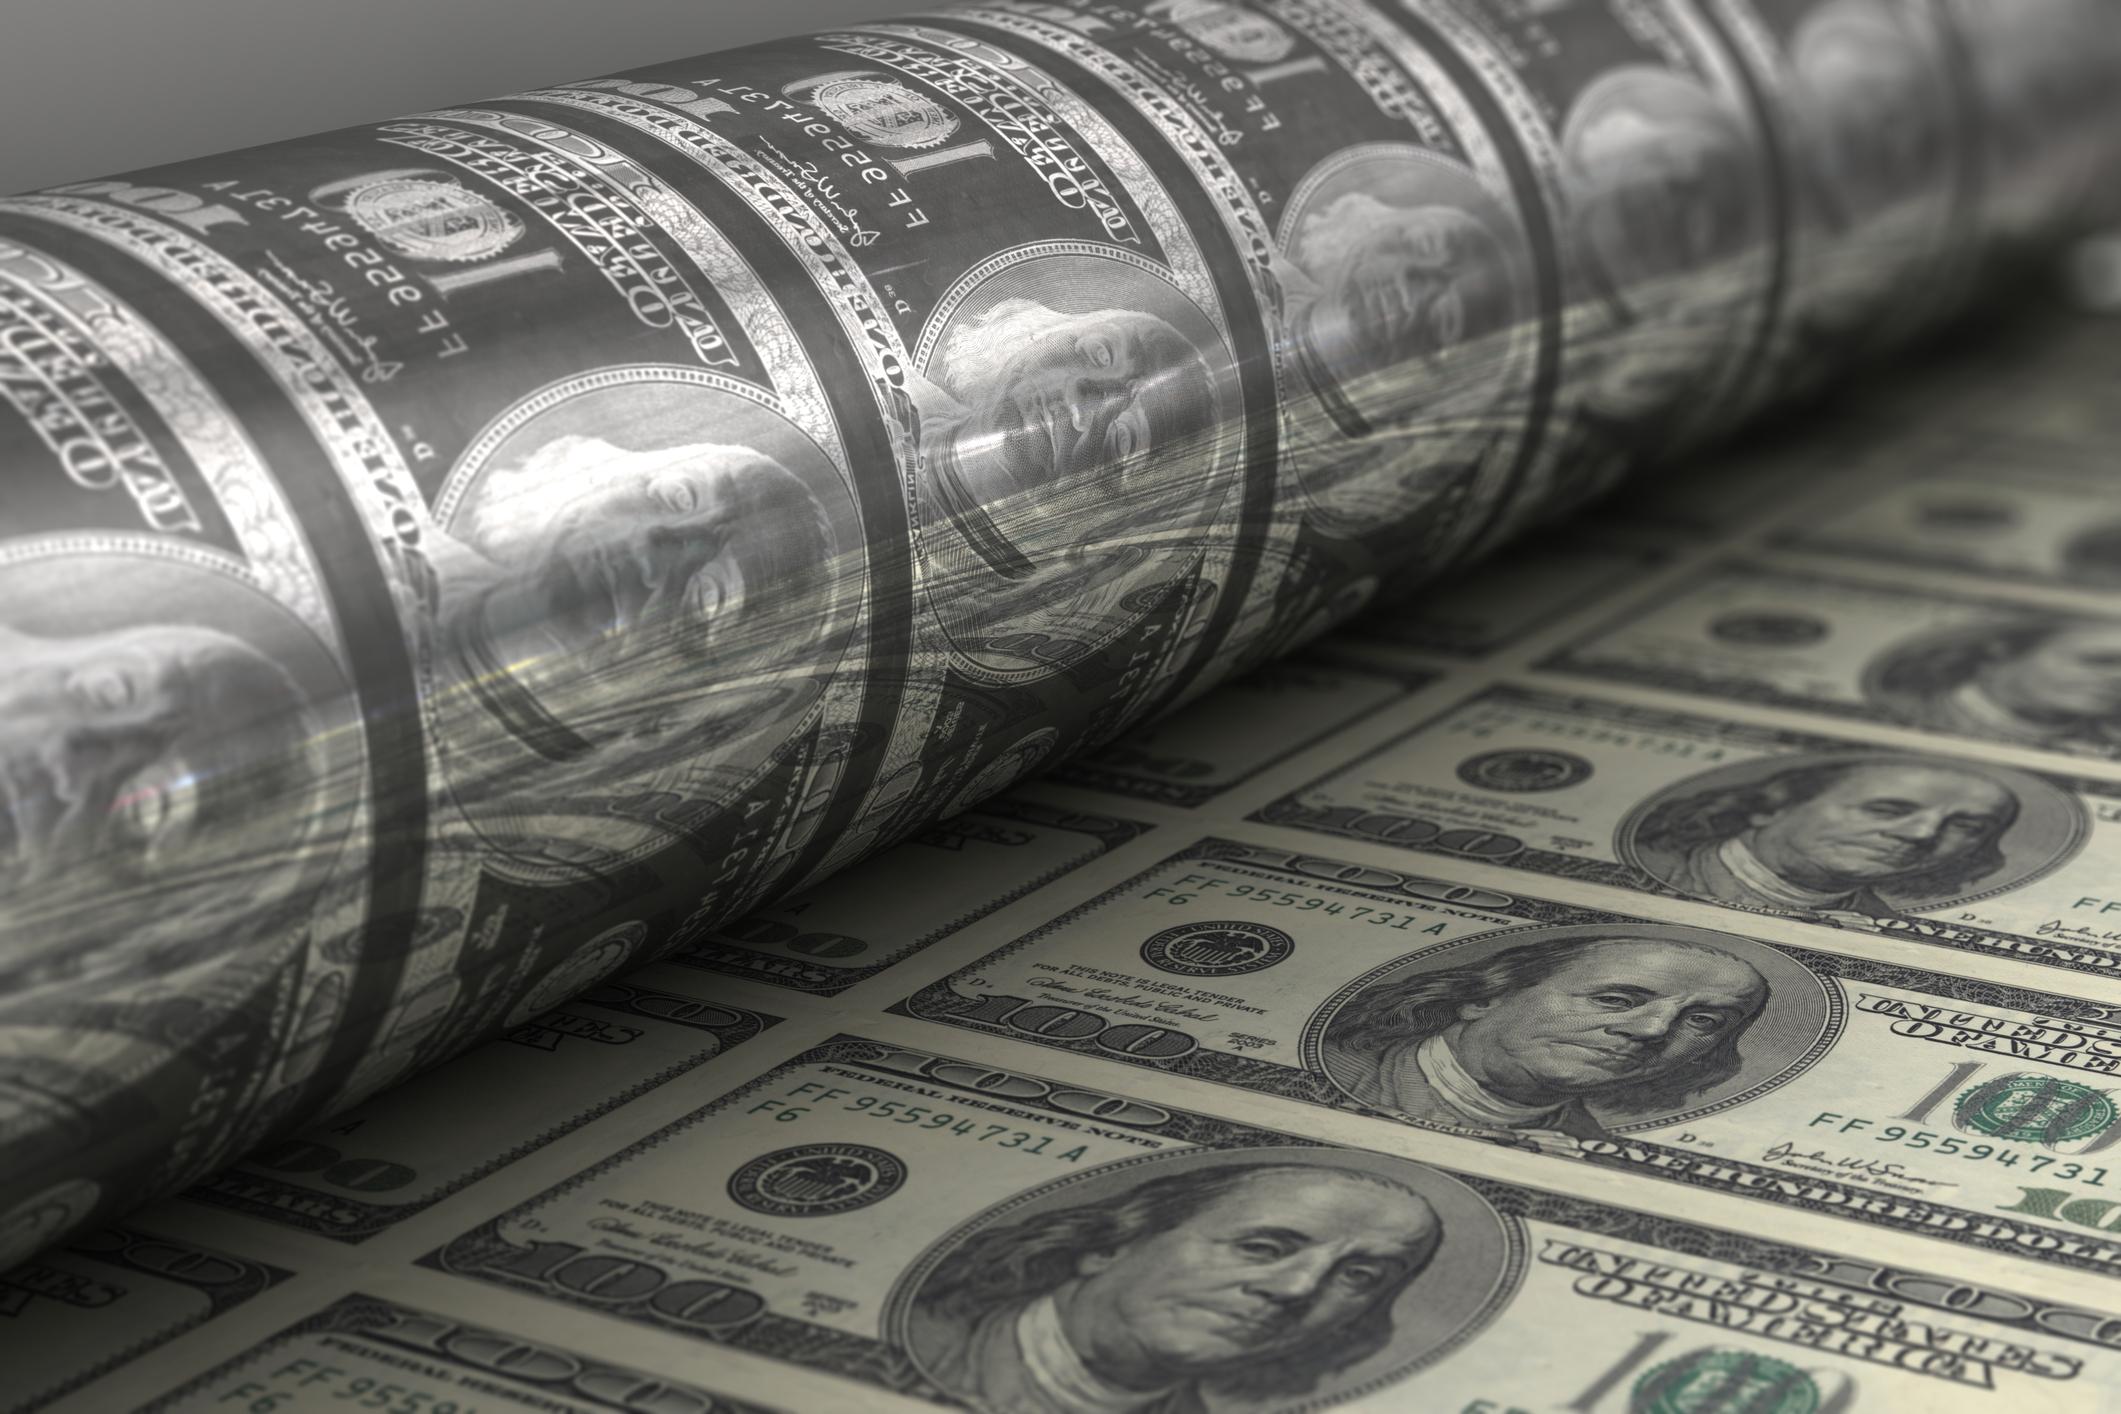 Rolls of $100 bills coming off a printer